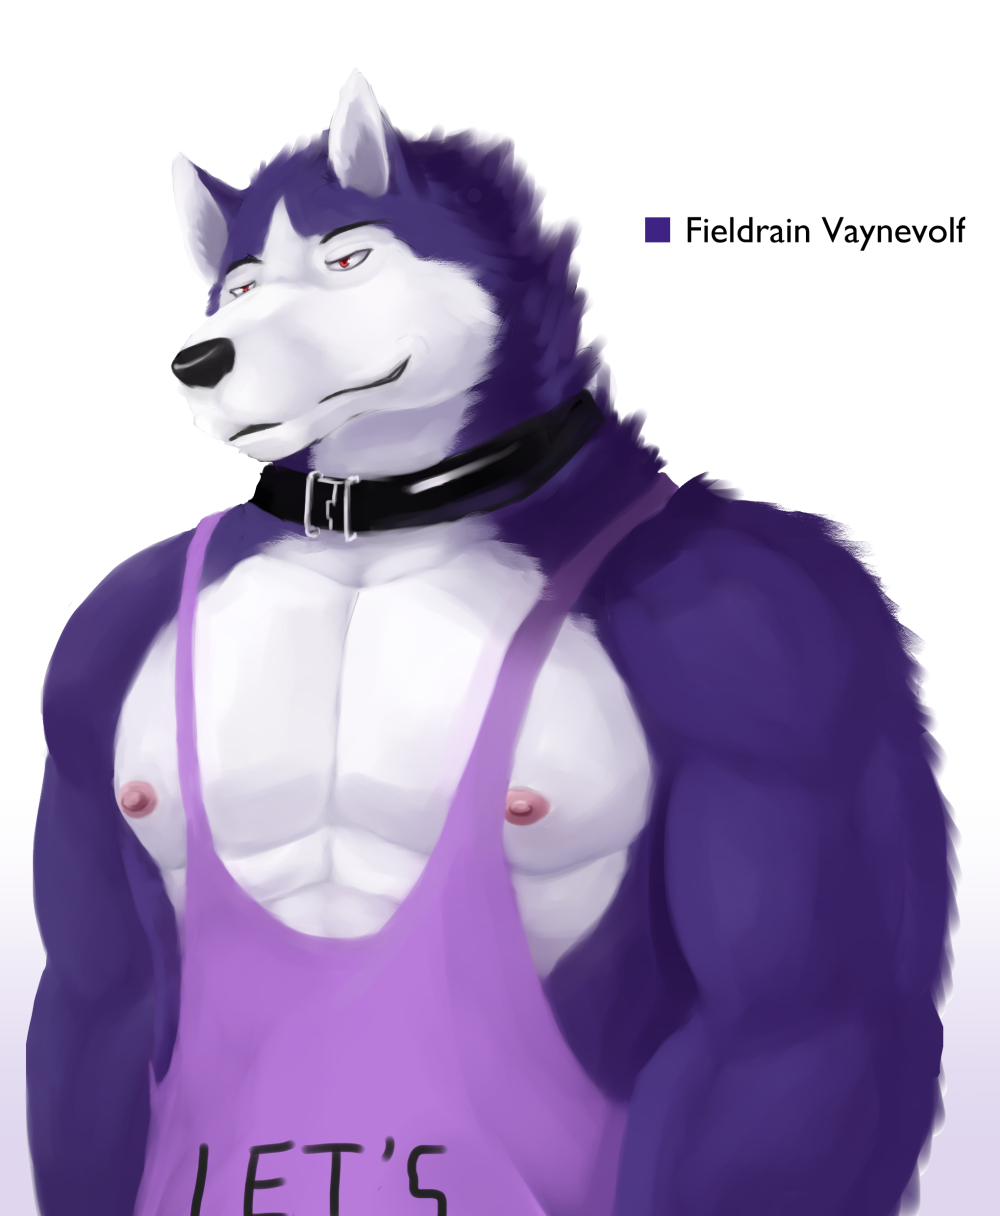 Most recent image: Fieldrain Vaynevolf